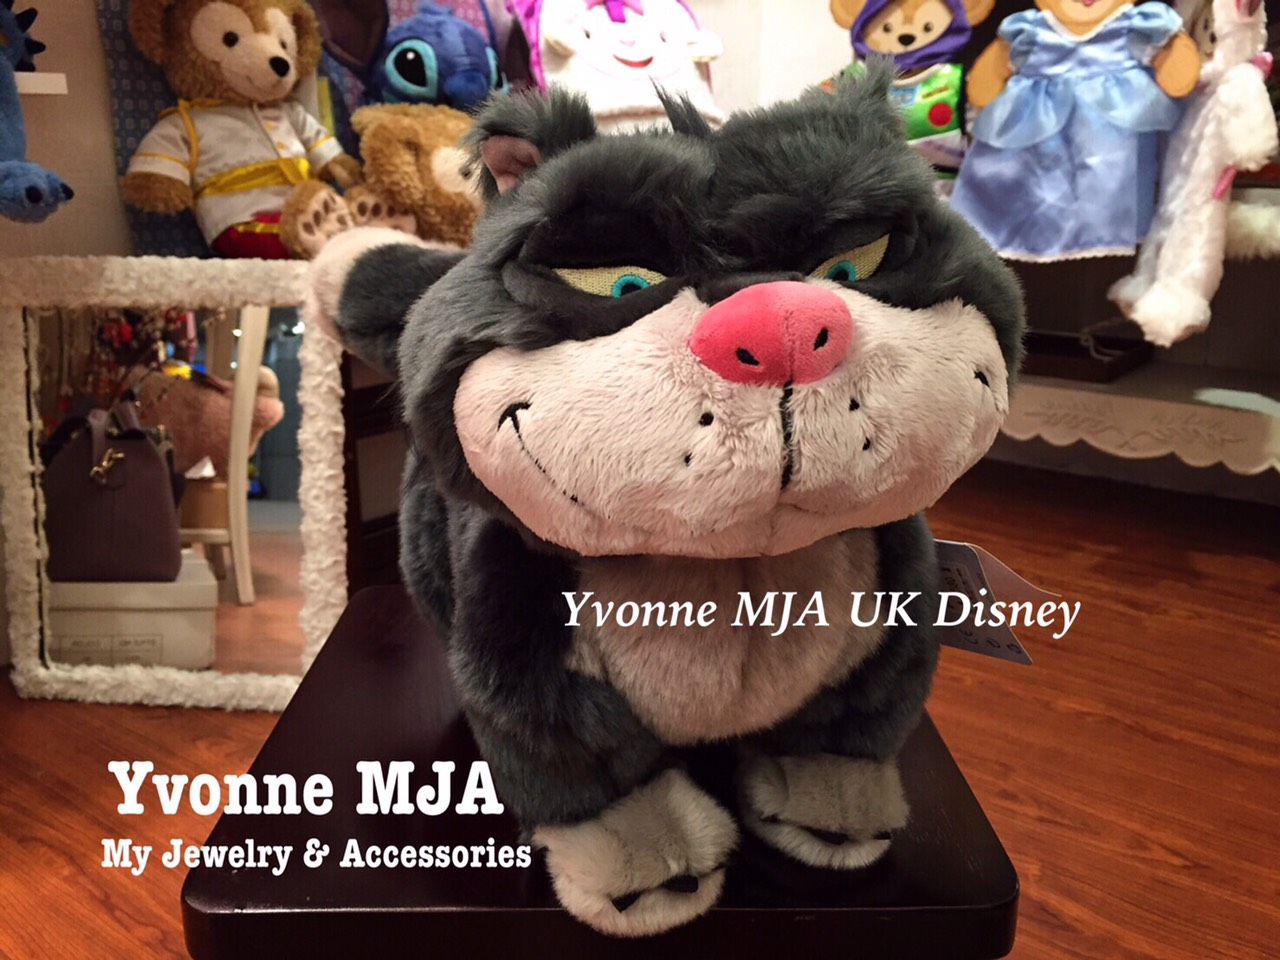 *Yvonne MJA英國代購*英國迪士尼Disney 商店限定正品仙履奇緣 貓咪 魯斯佛 Lucifer 大型娃娃現貨